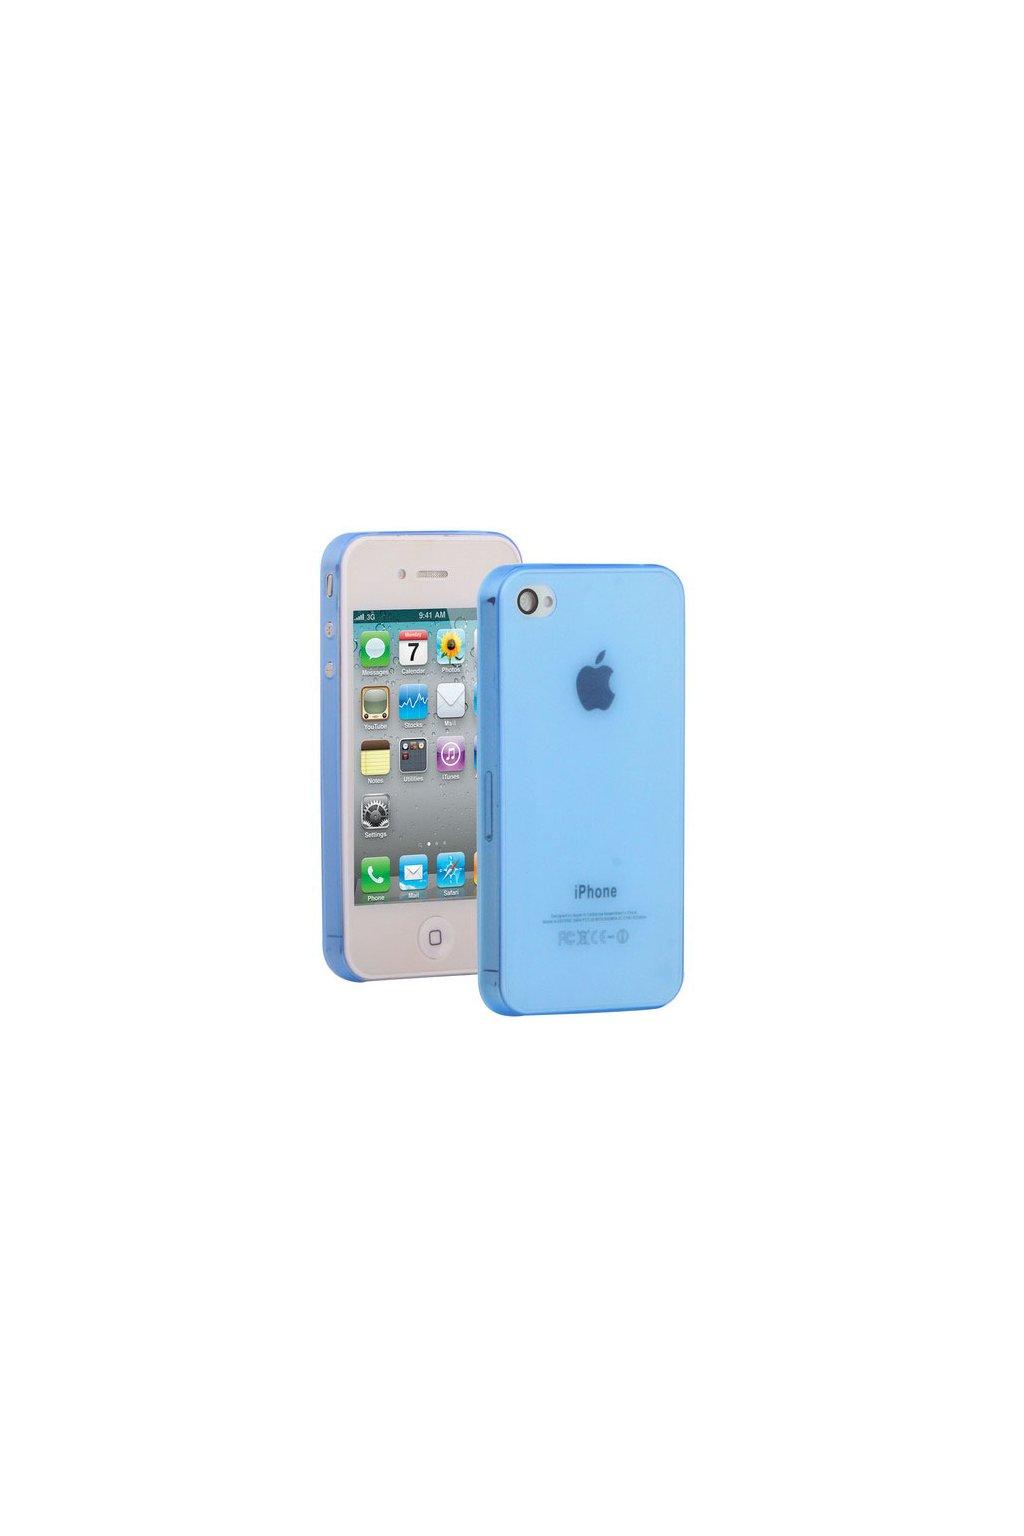 Pouzdro ultra tenké Thin iPhone 4/4S, blue/modrá